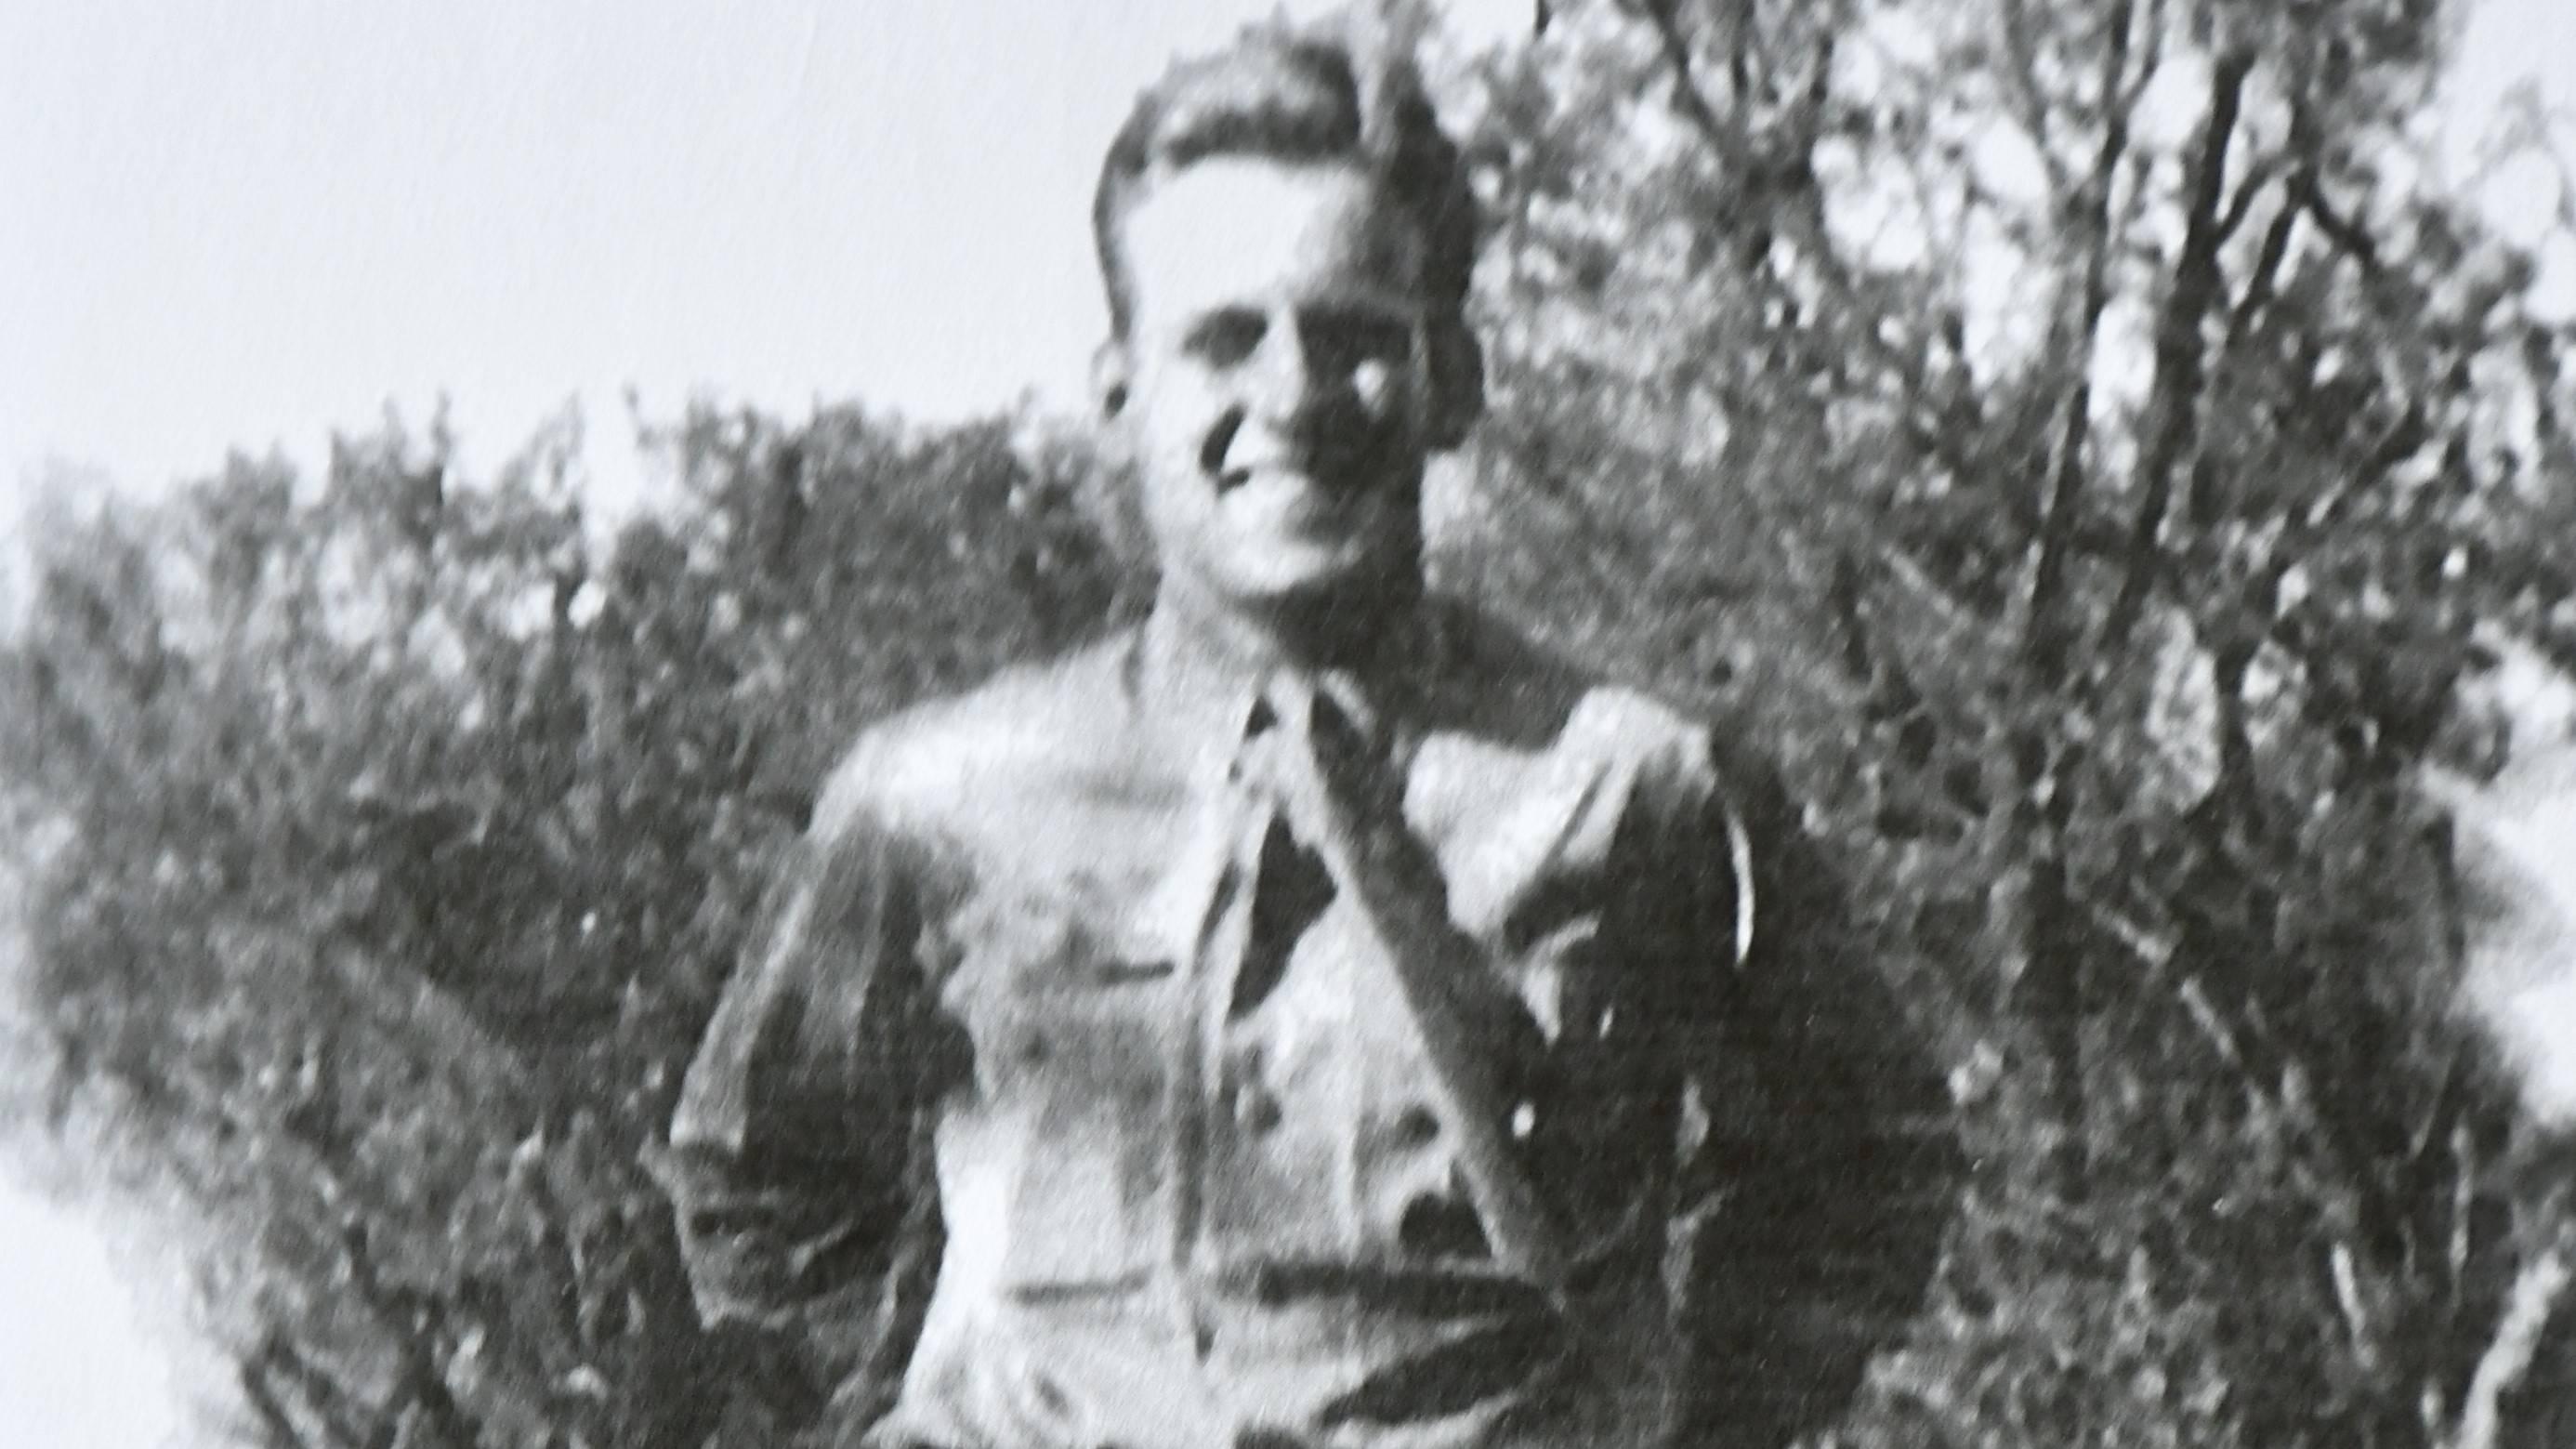 Rapid City resident Bill Lofgren